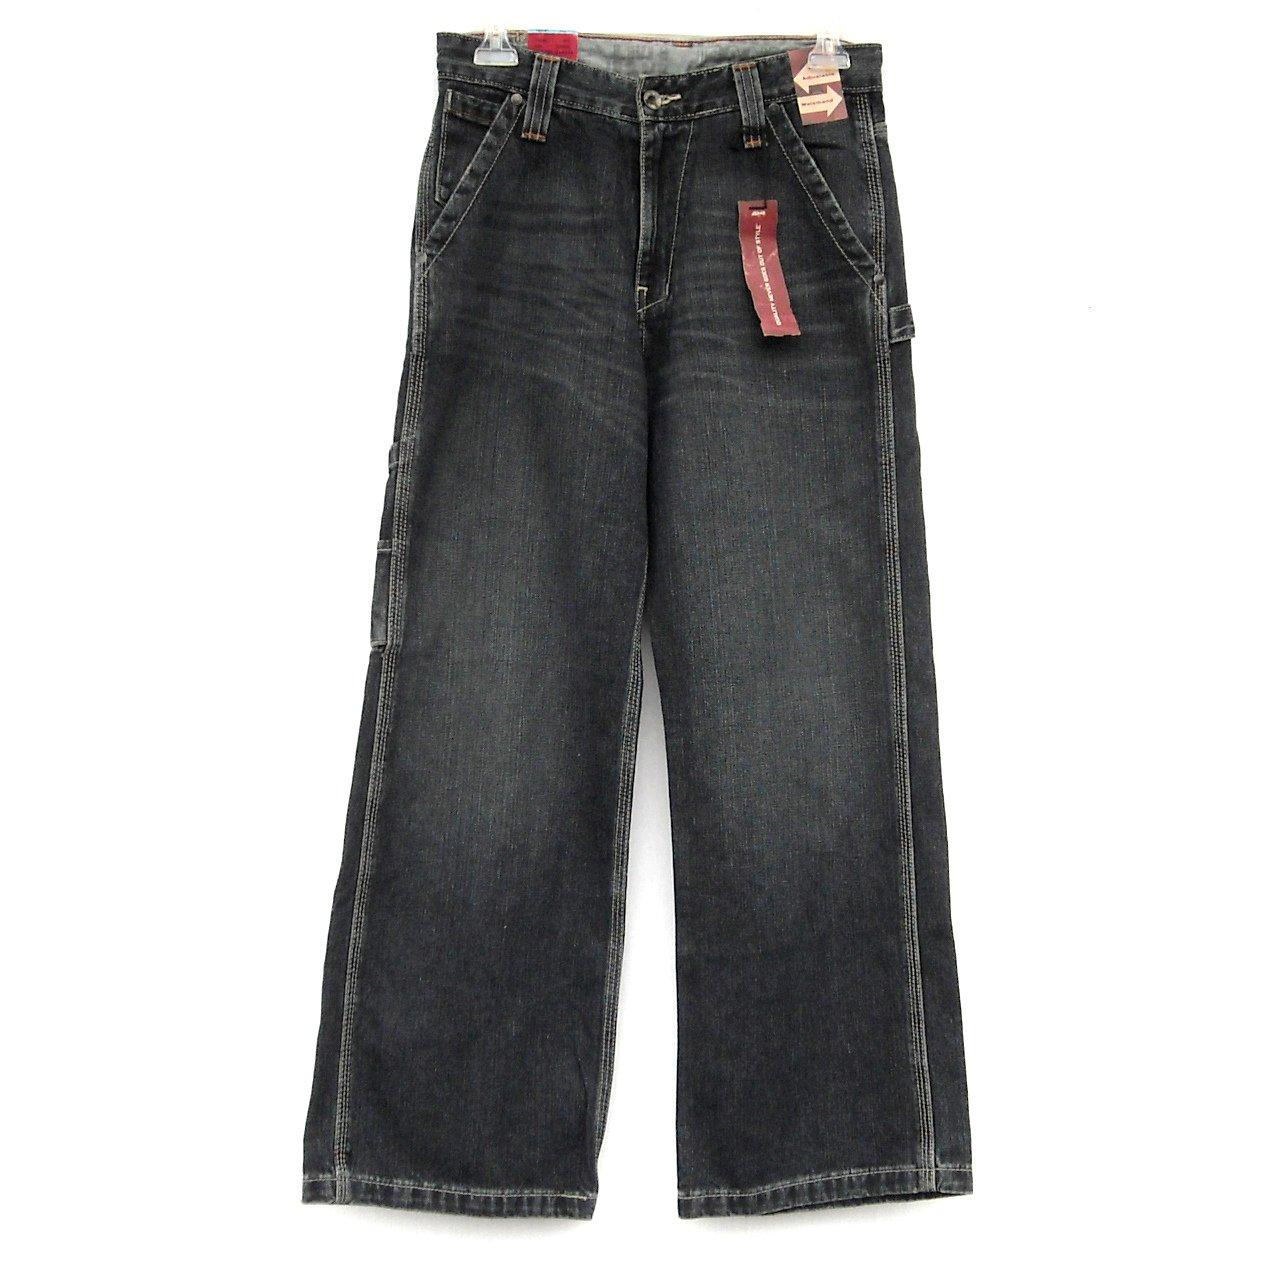 Levi's Painter Adj Waist Black Jeans Size 14 Regular